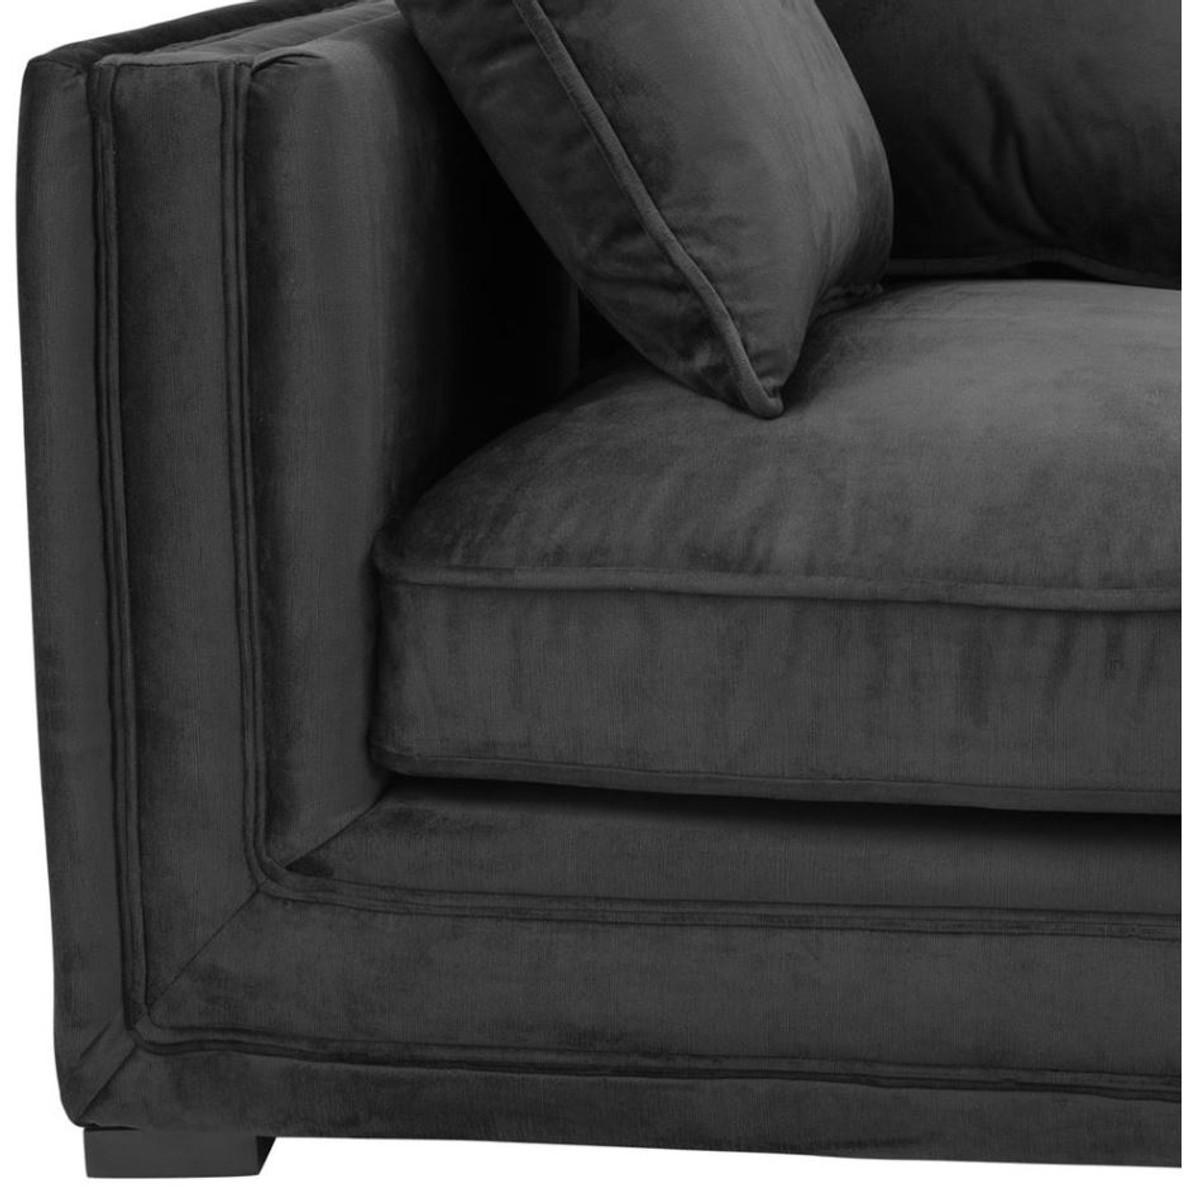 casa padrino luxus designer 3er sofa schwarz luxus hotel m bel sofas luxus hotel sofas. Black Bedroom Furniture Sets. Home Design Ideas